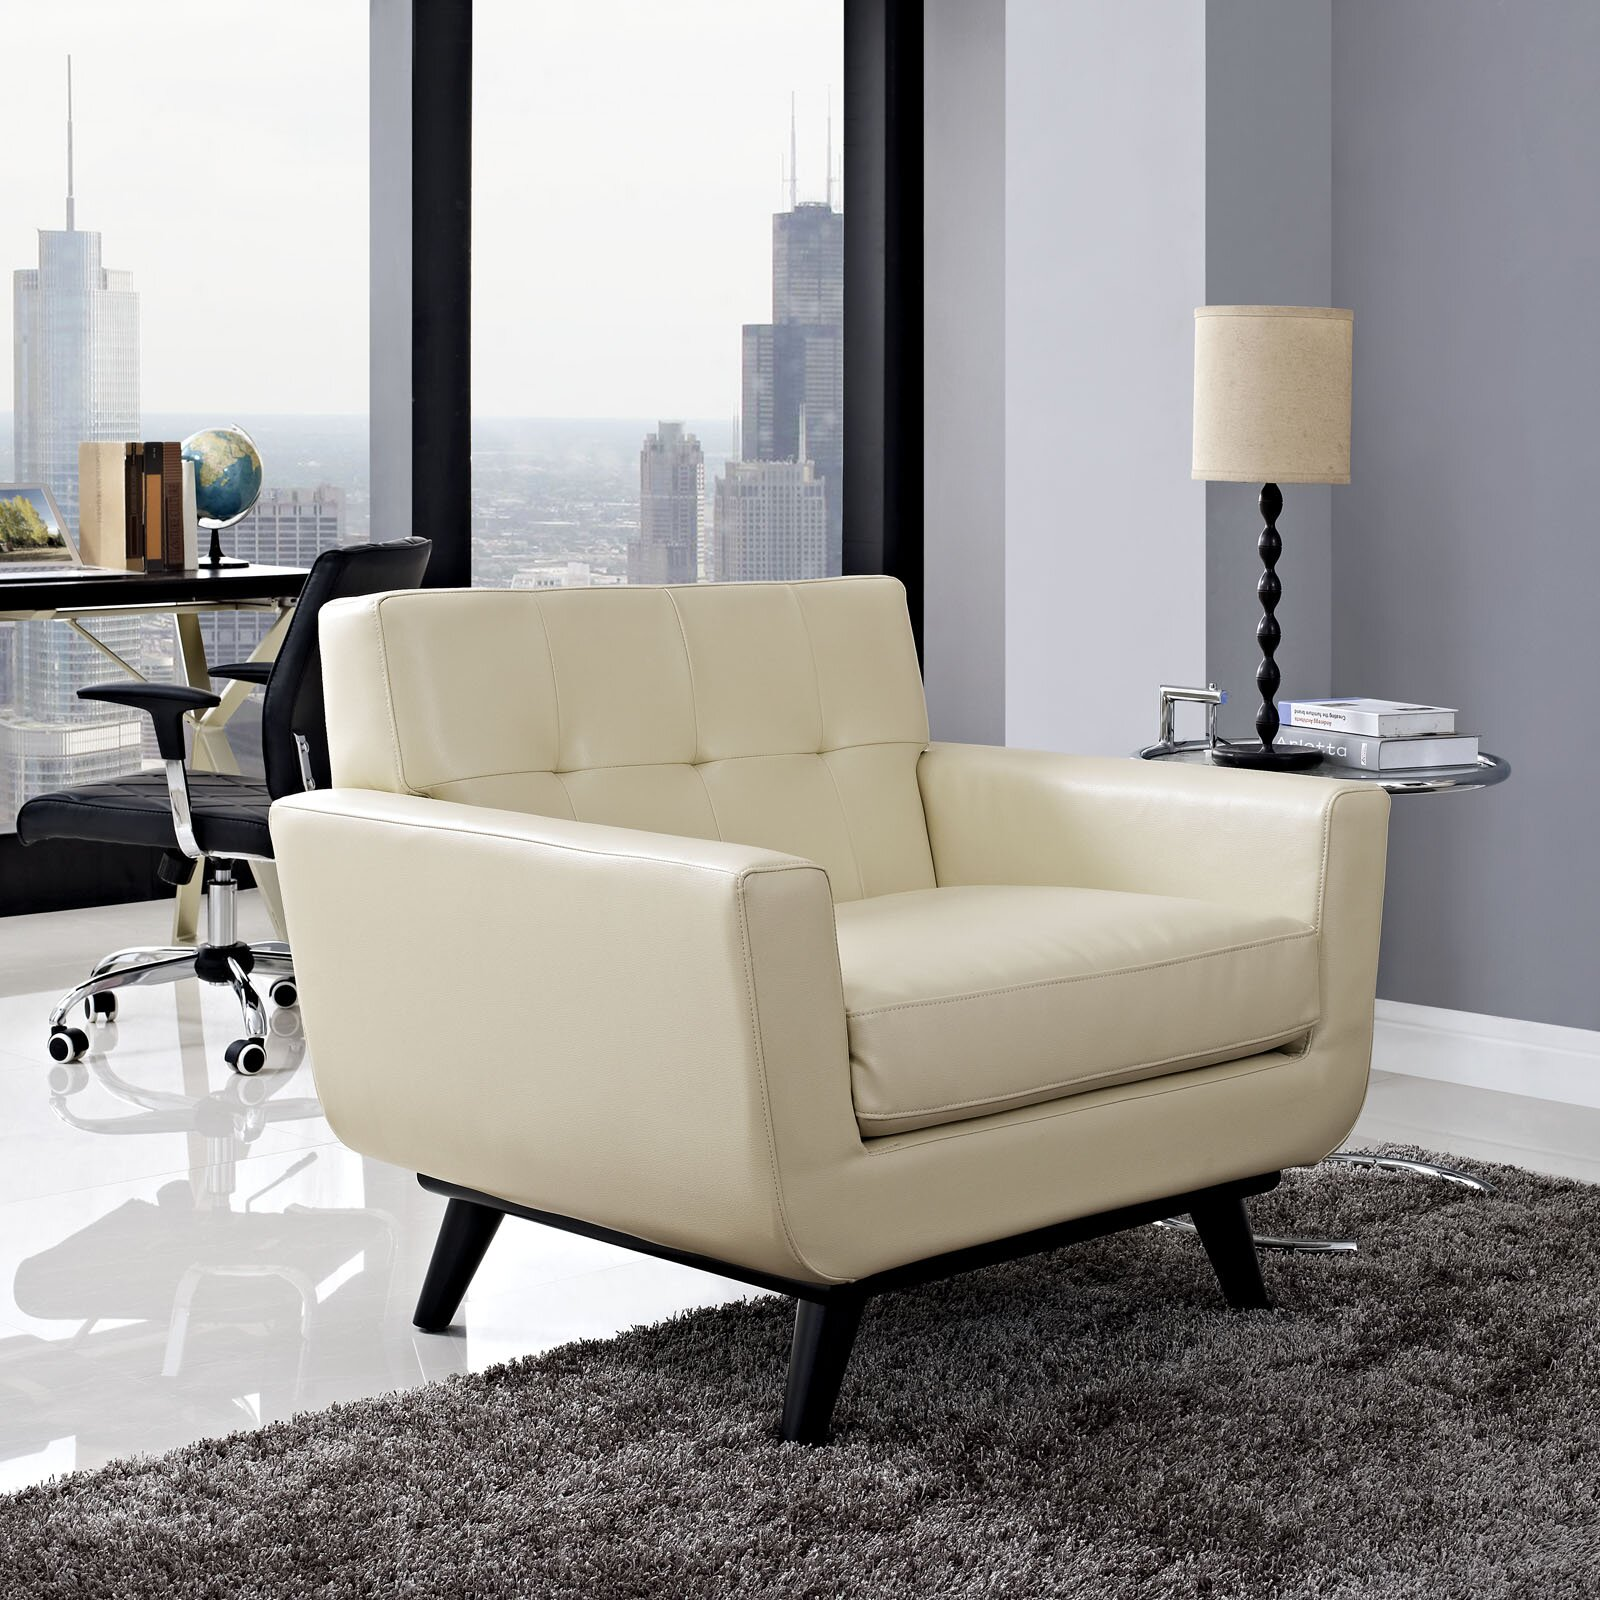 Living Room Arm Chairs Corrigan Studio Saginaw Leather Arm Chair Reviews Wayfair